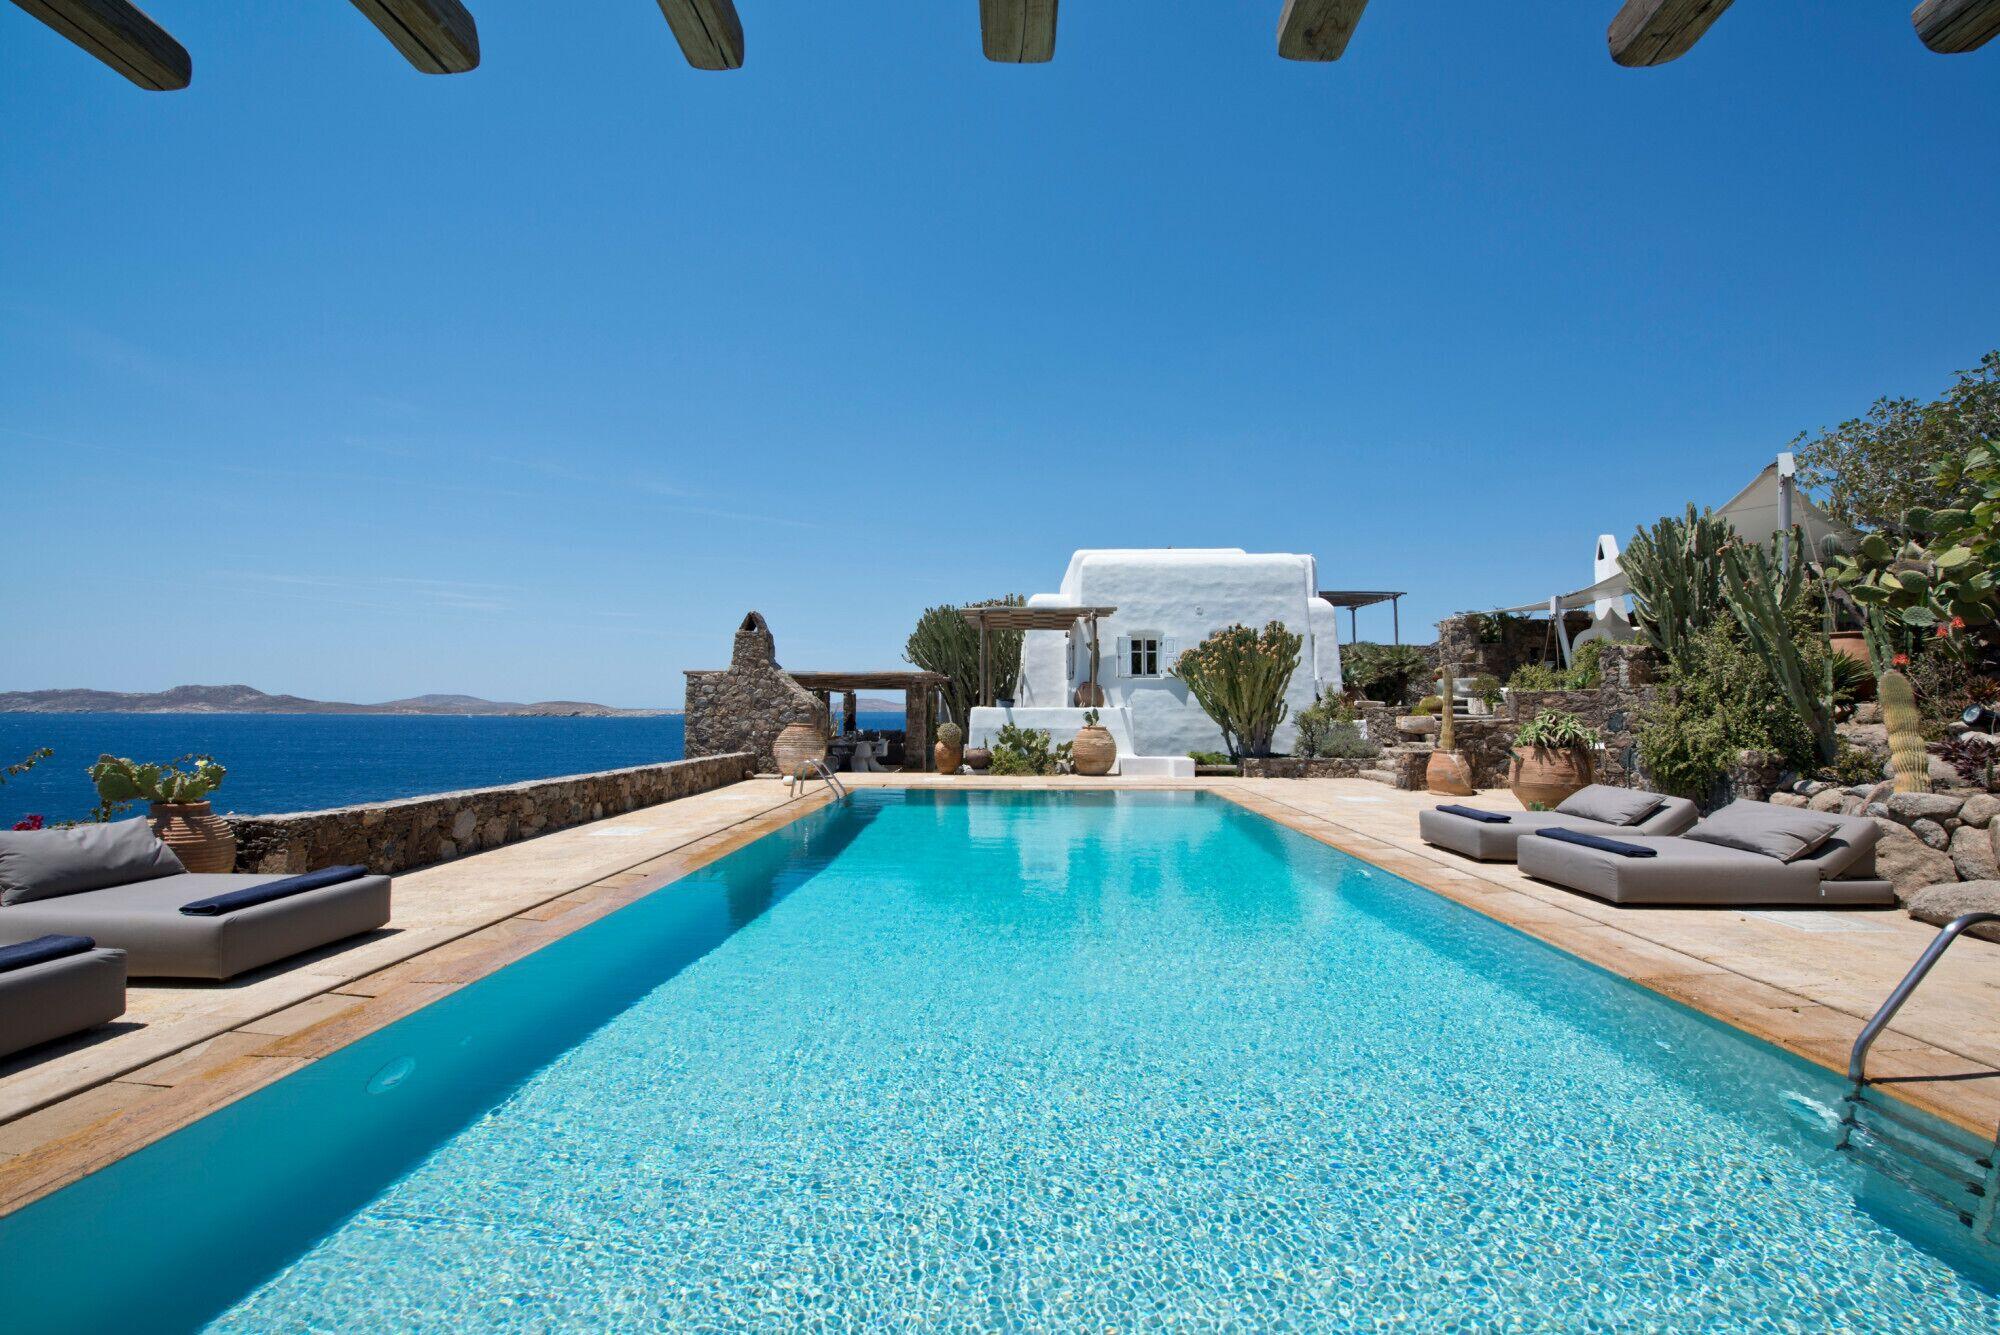 Villa St Johns Retreat 7 Bedroom Villa In Saint John With Private Pool